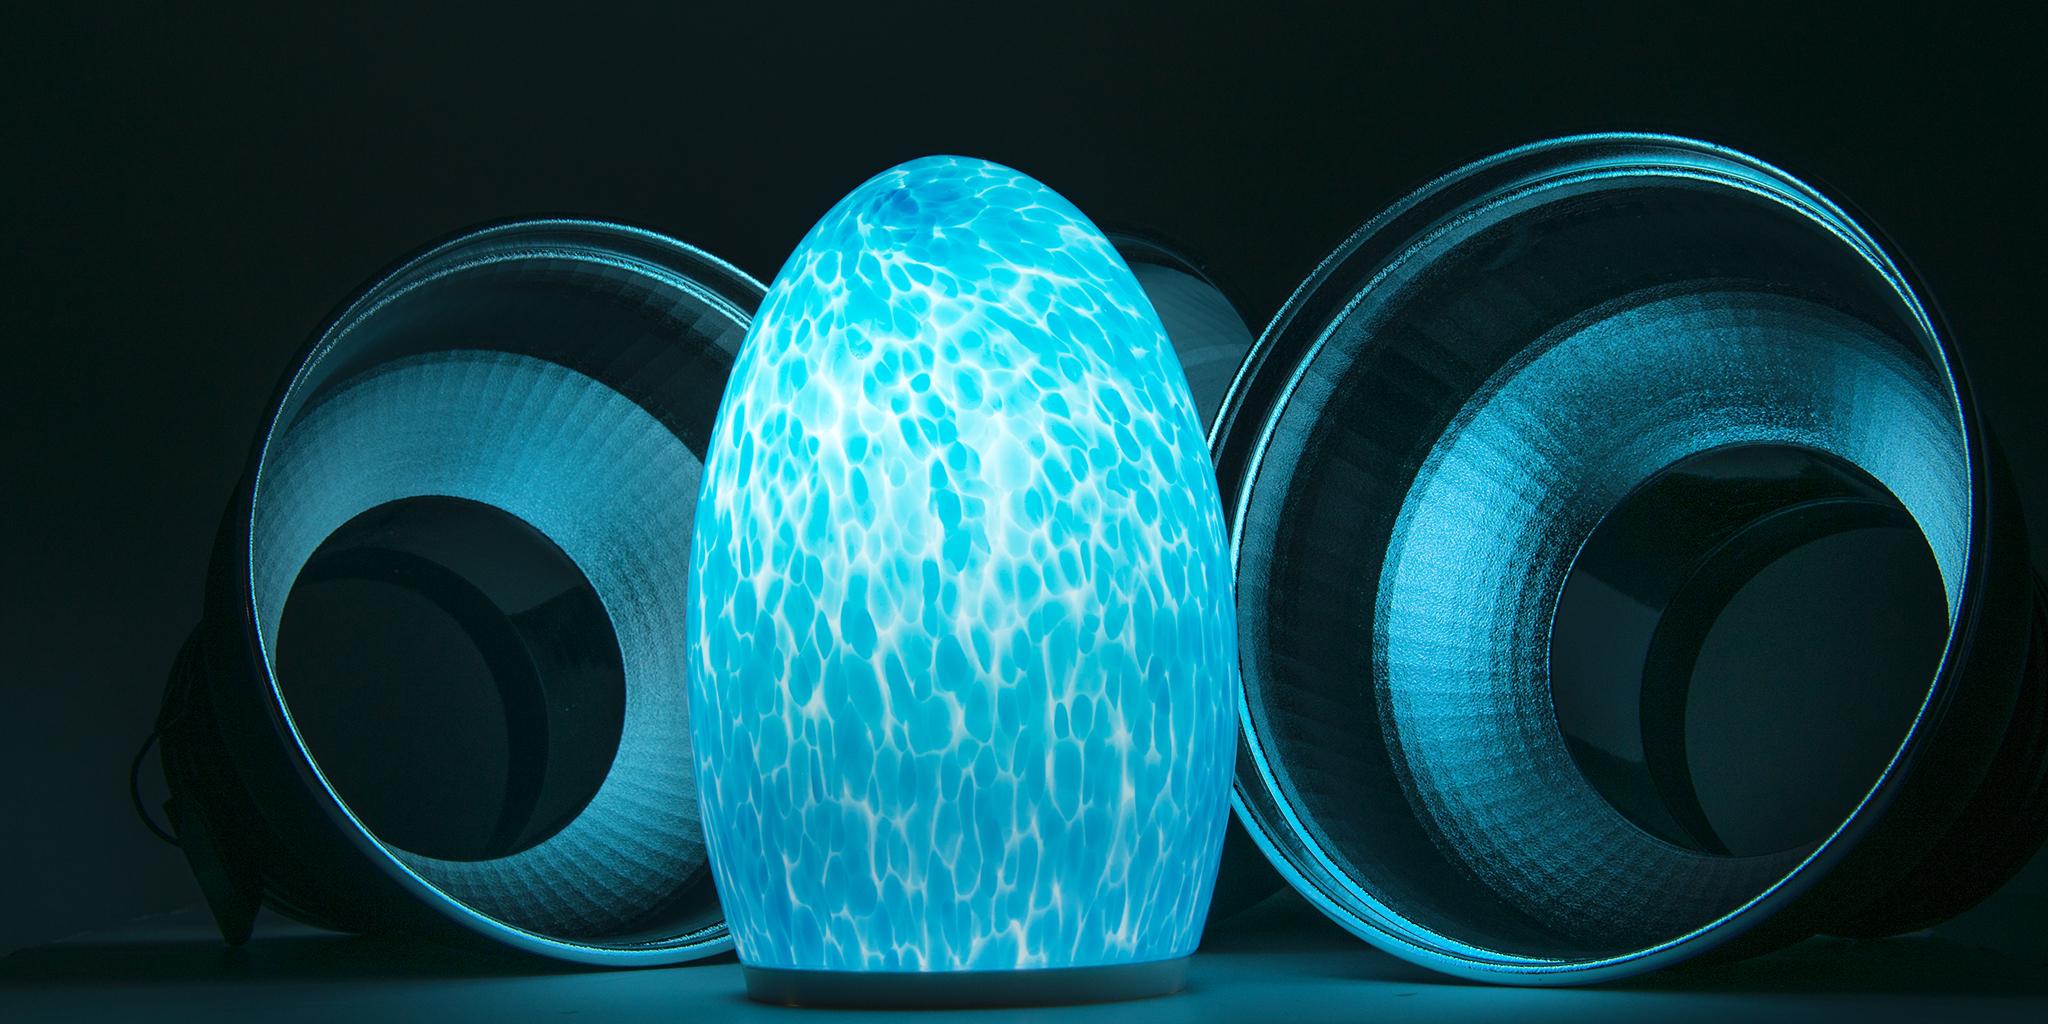 tops_lamps.jpg